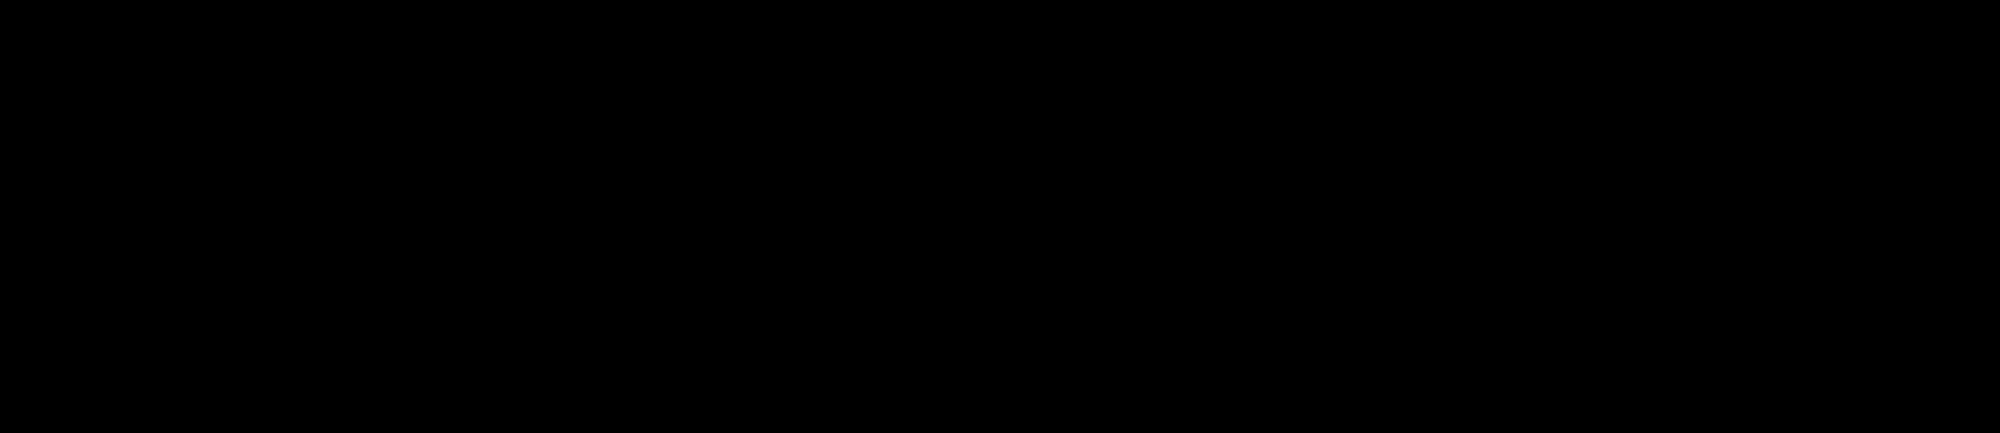 dolby stereo logos rh logolynx com dolby stereo logopedia other dolby stereo logo timeline wiki